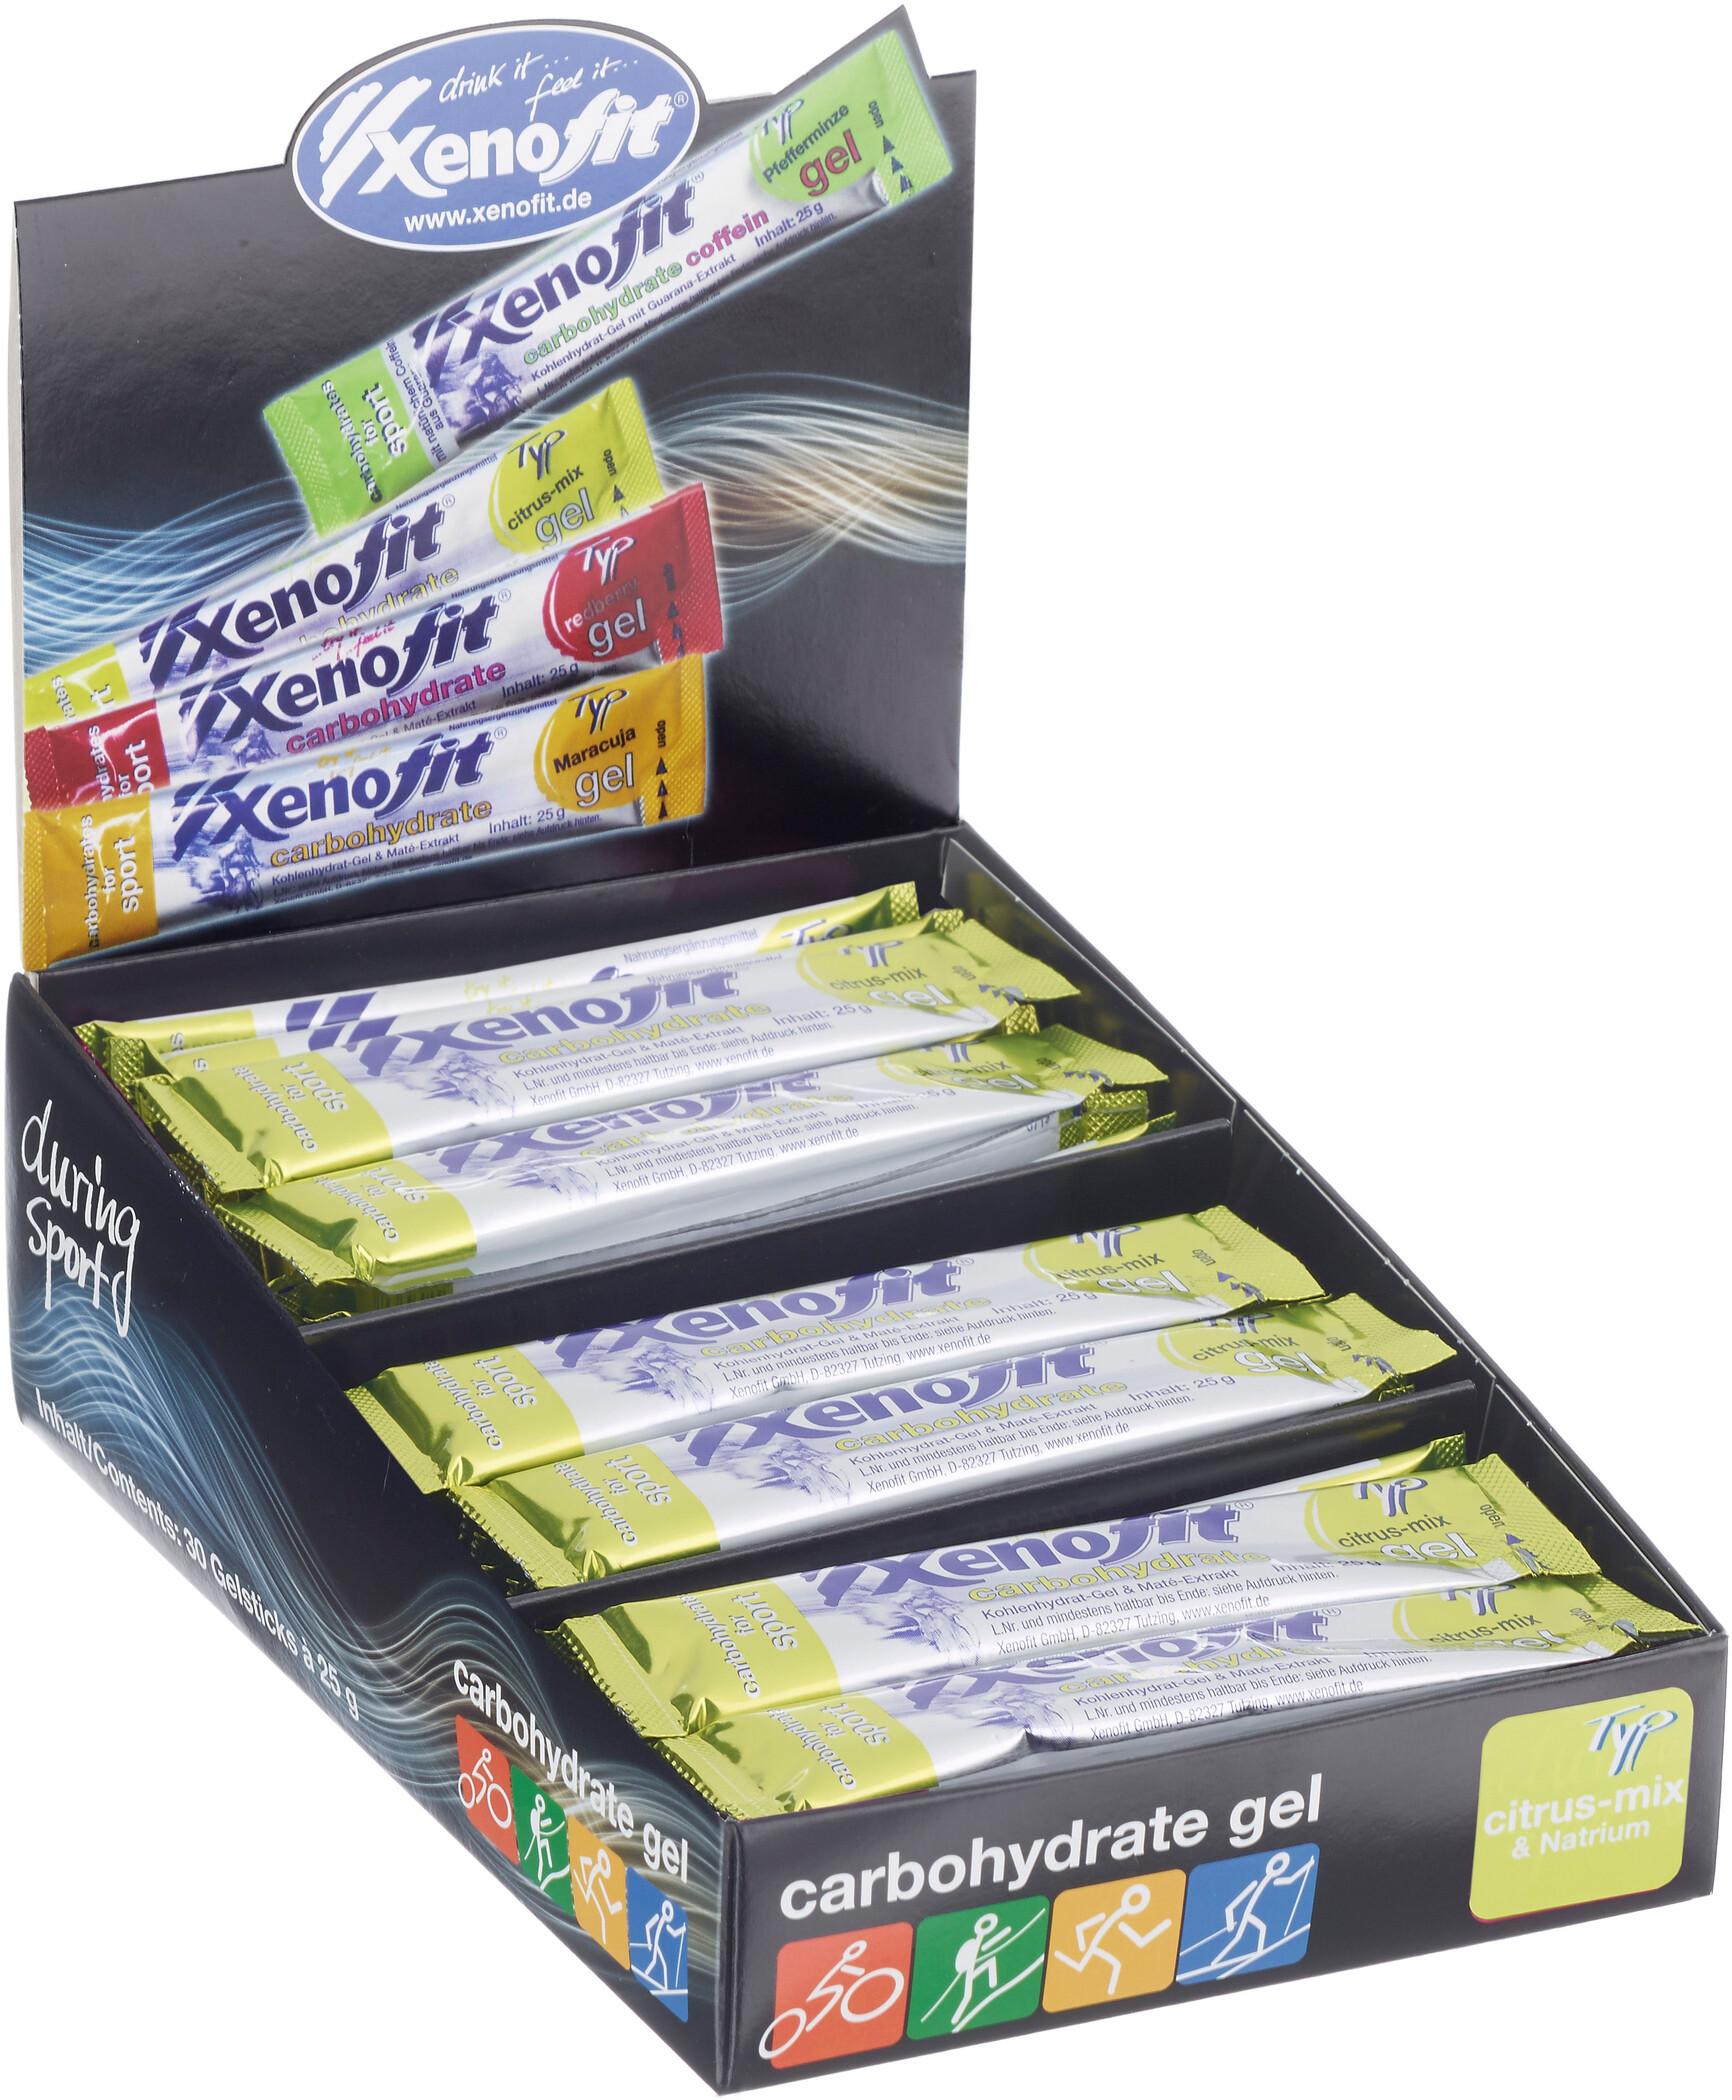 Xenofit Carbohydrate Gel Box 30x25g, Citrus-Mix (2019) | item_misc